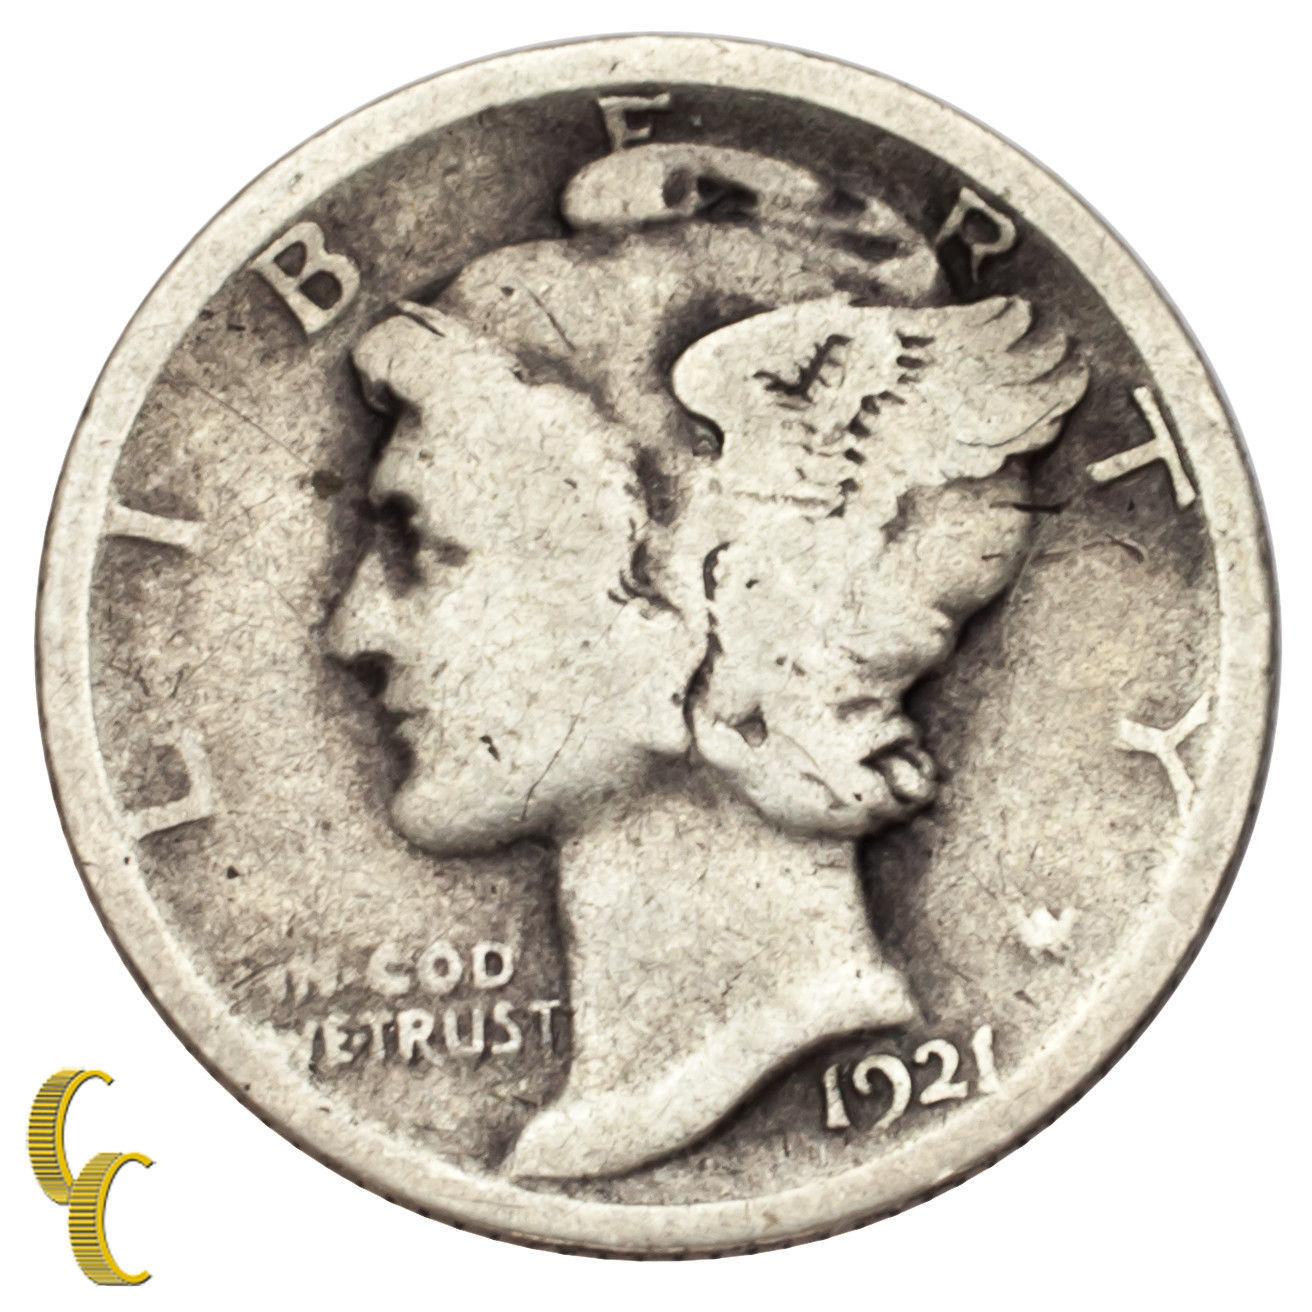 1921 Silver Mercury Dime 10C (Very Good, VG Condition)